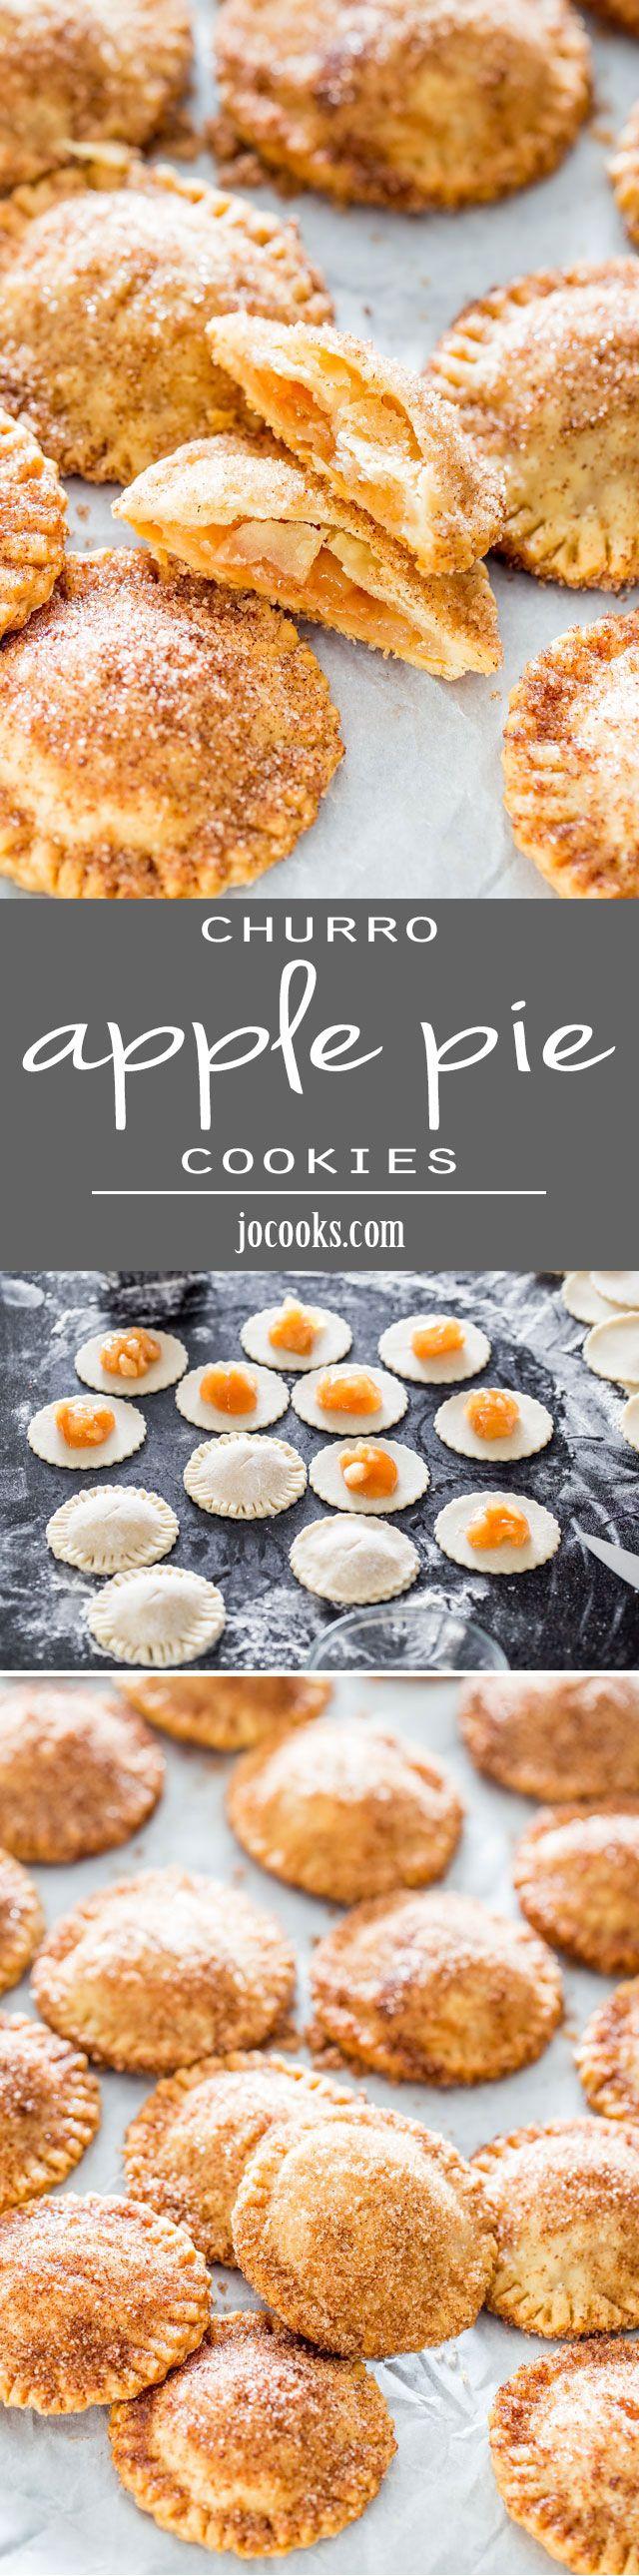 Churro Apple Pie Cookies - Jo Cooks